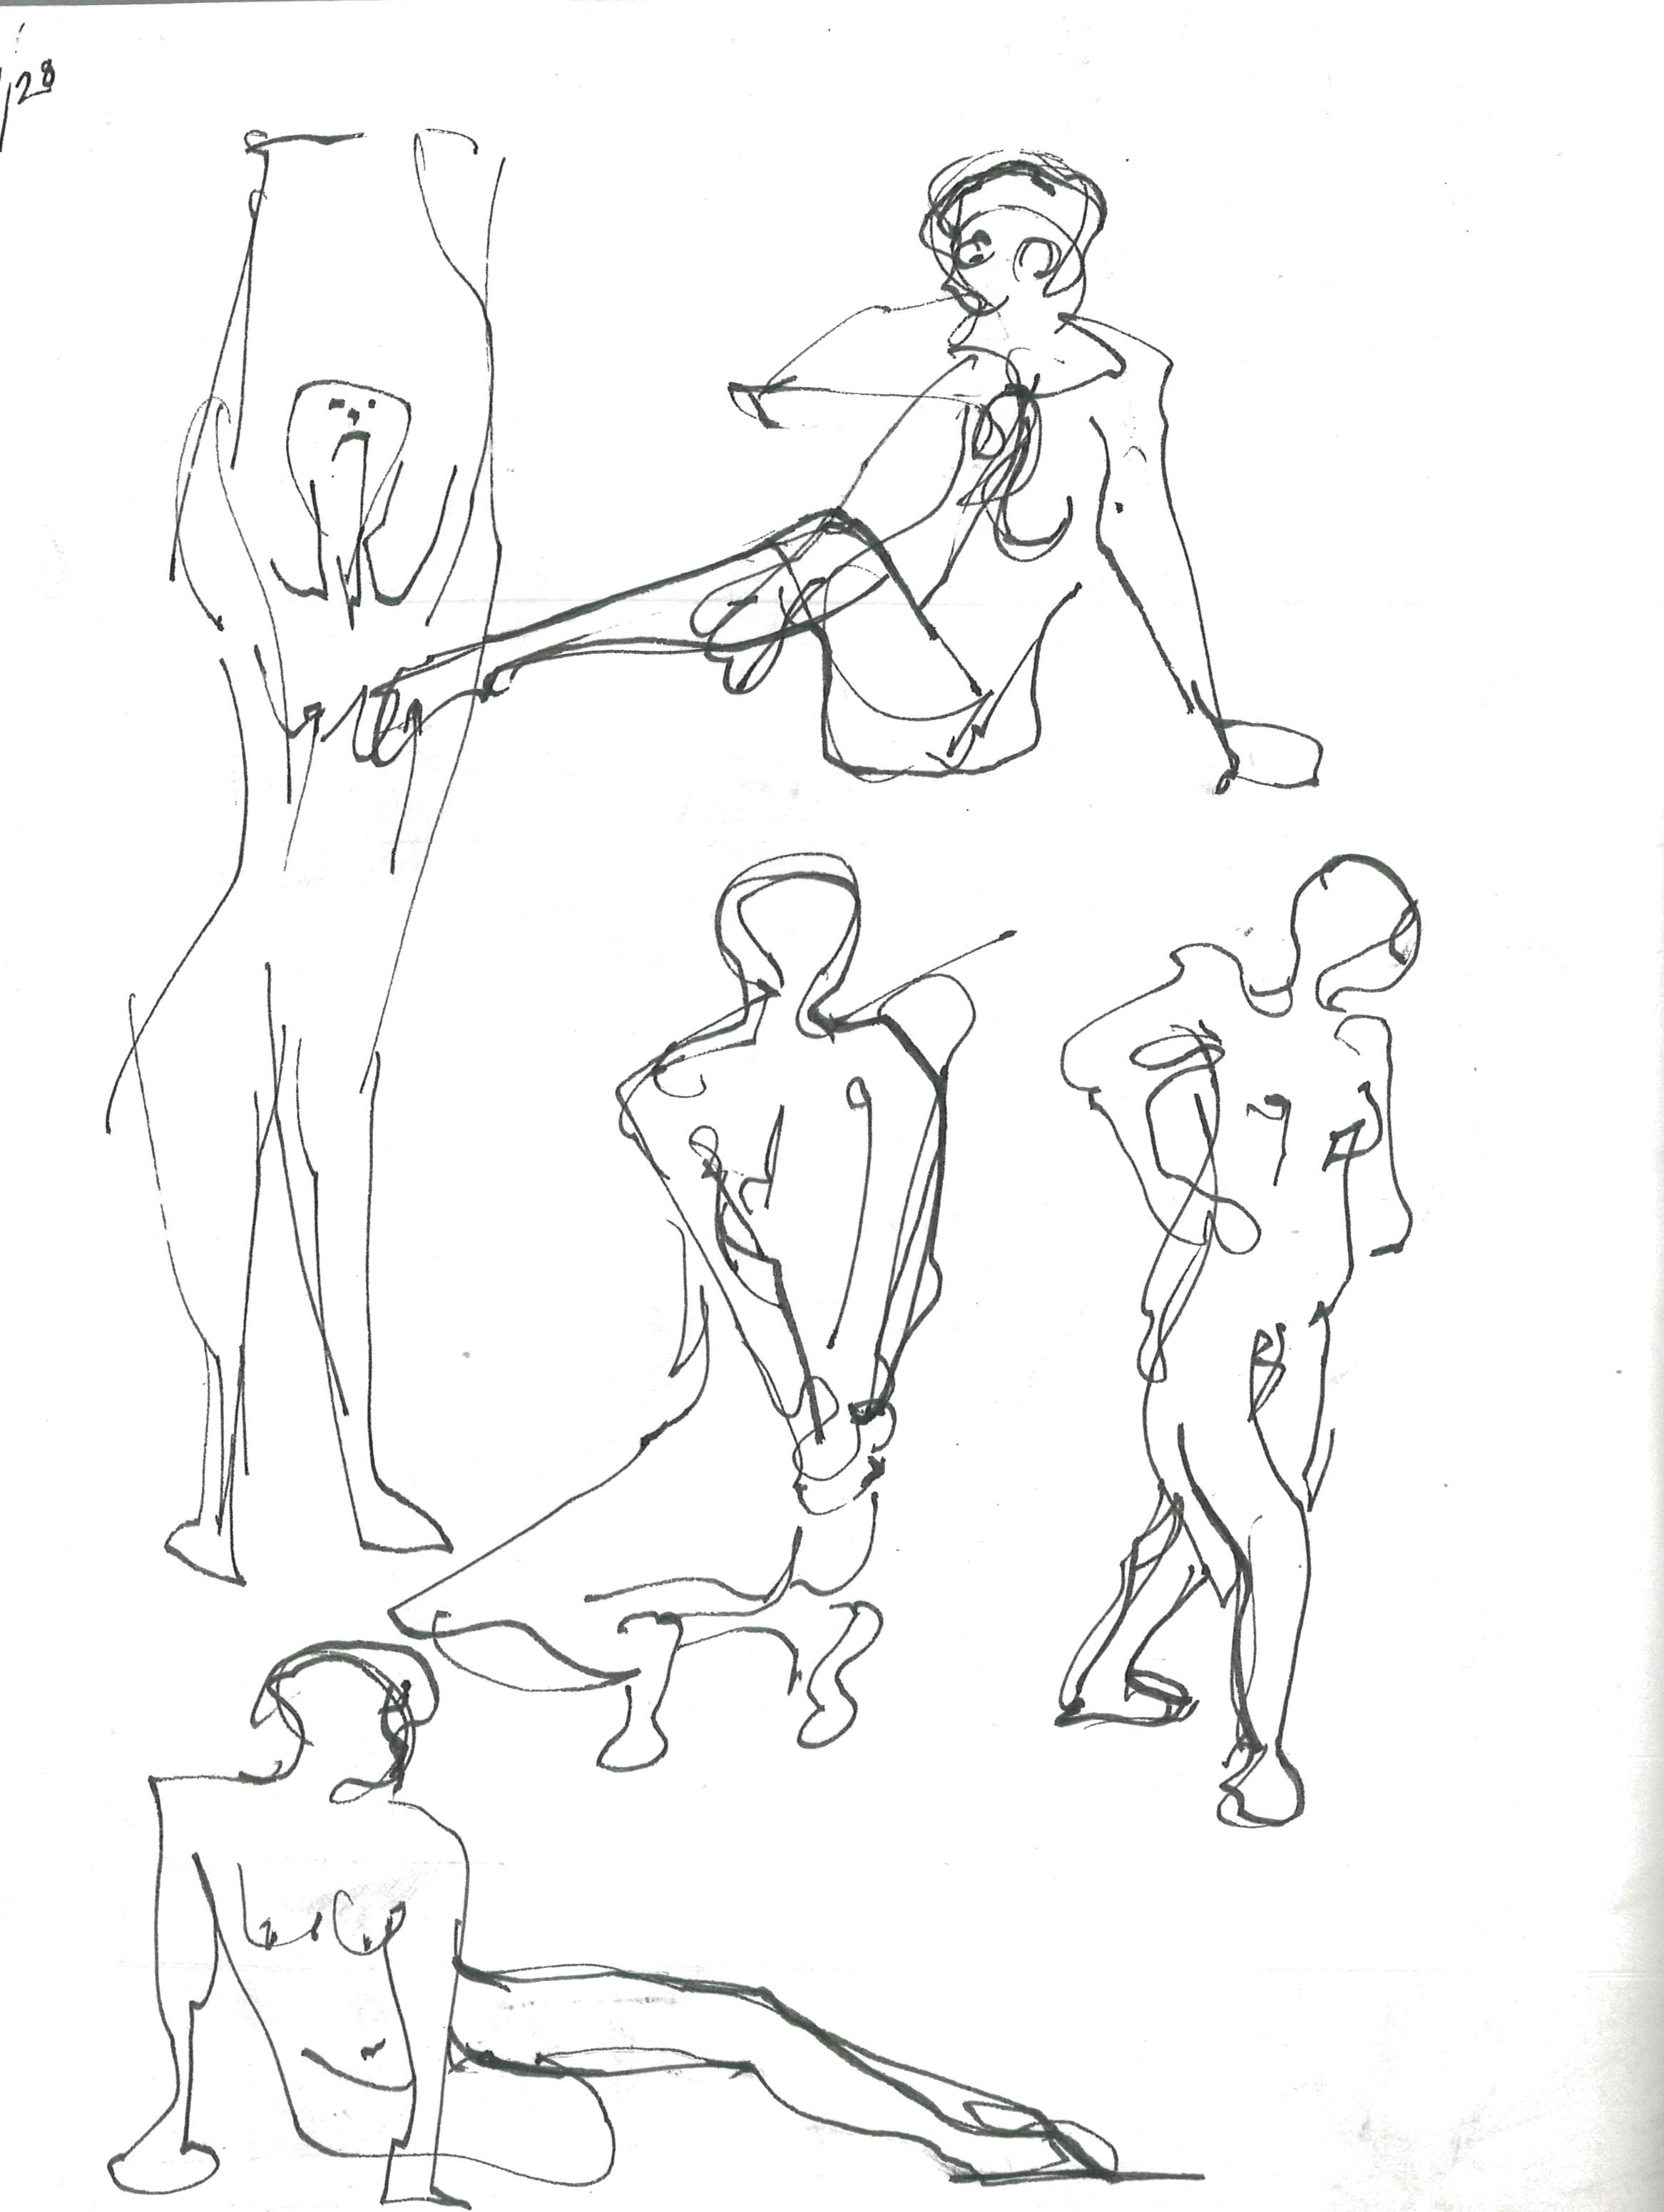 FIGURE_1_SketchbookA_ScanE_Page_5.jpg